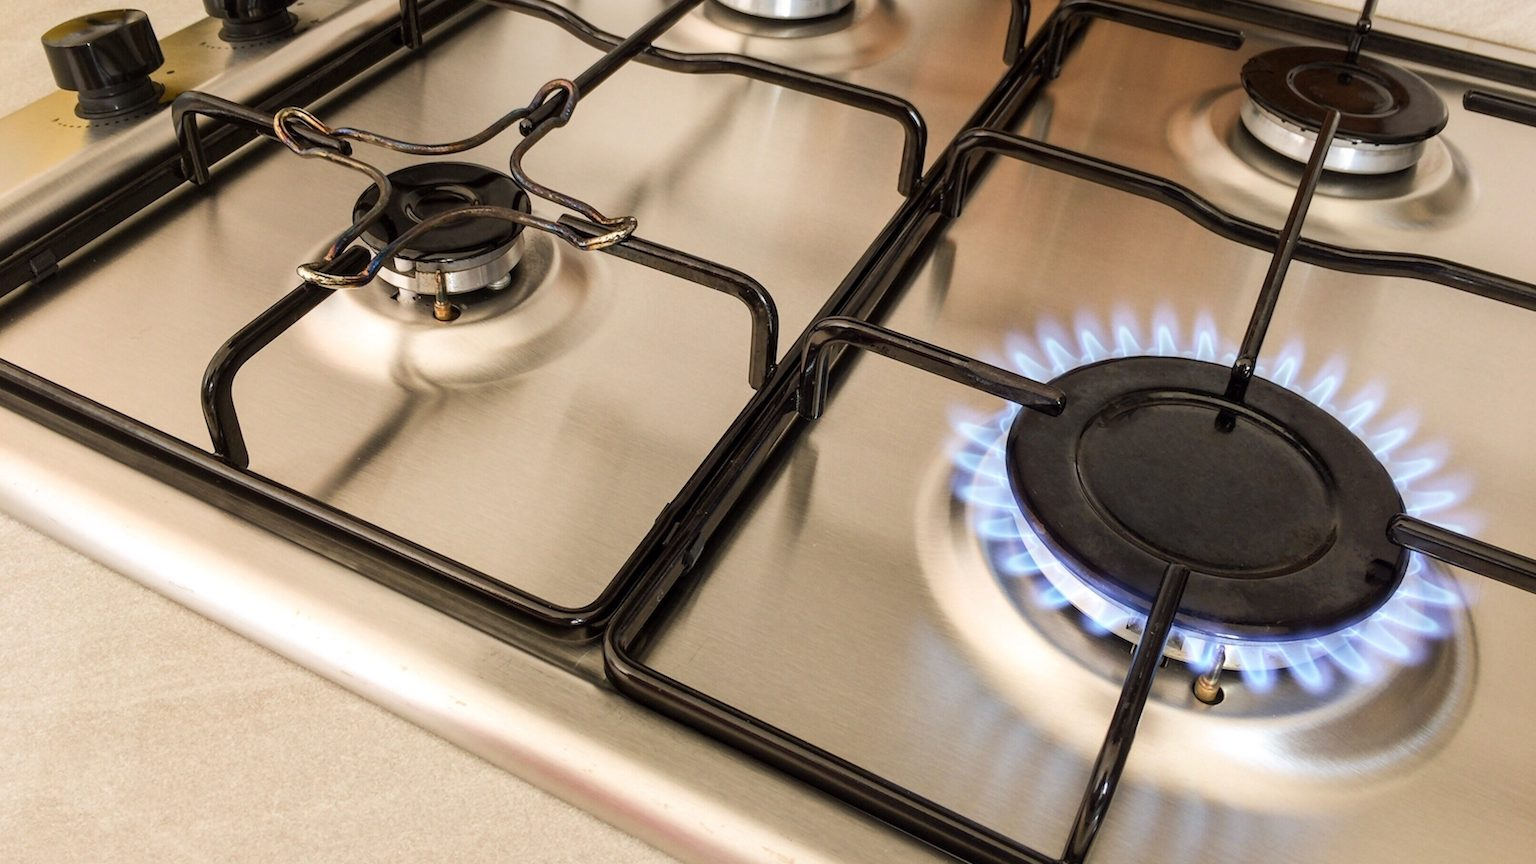 Close up of a gas burner